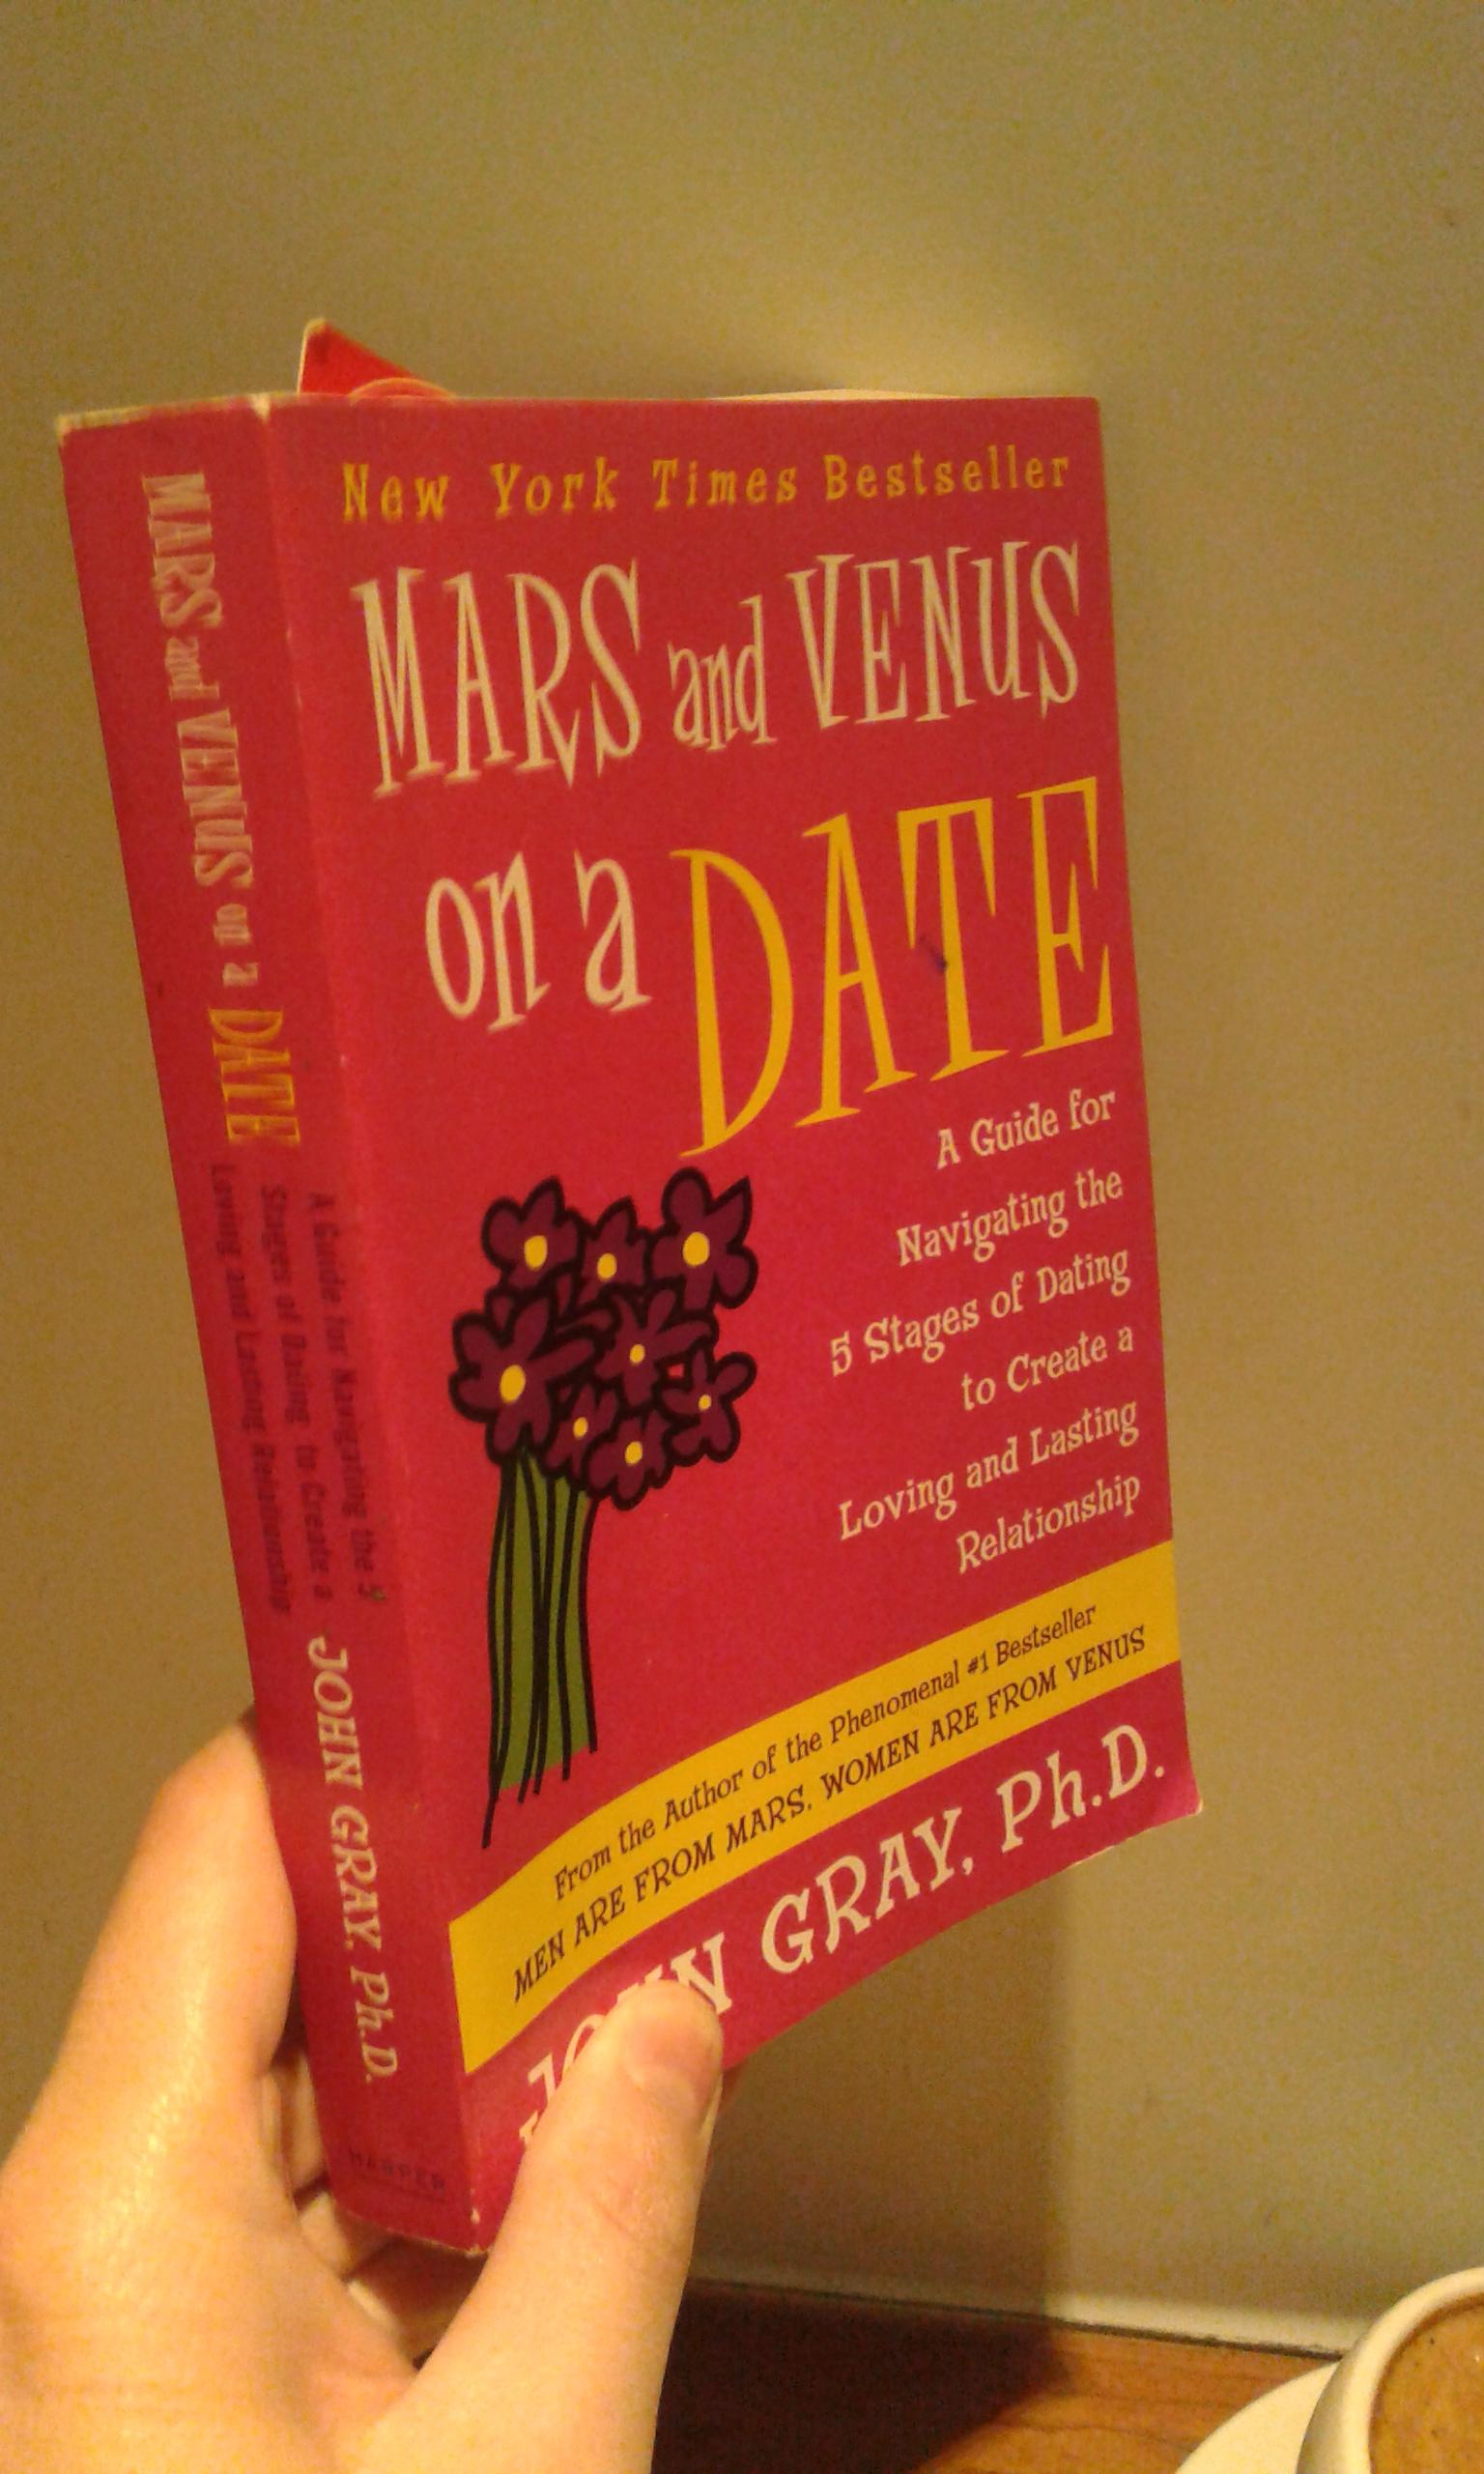 Venus dating 2014